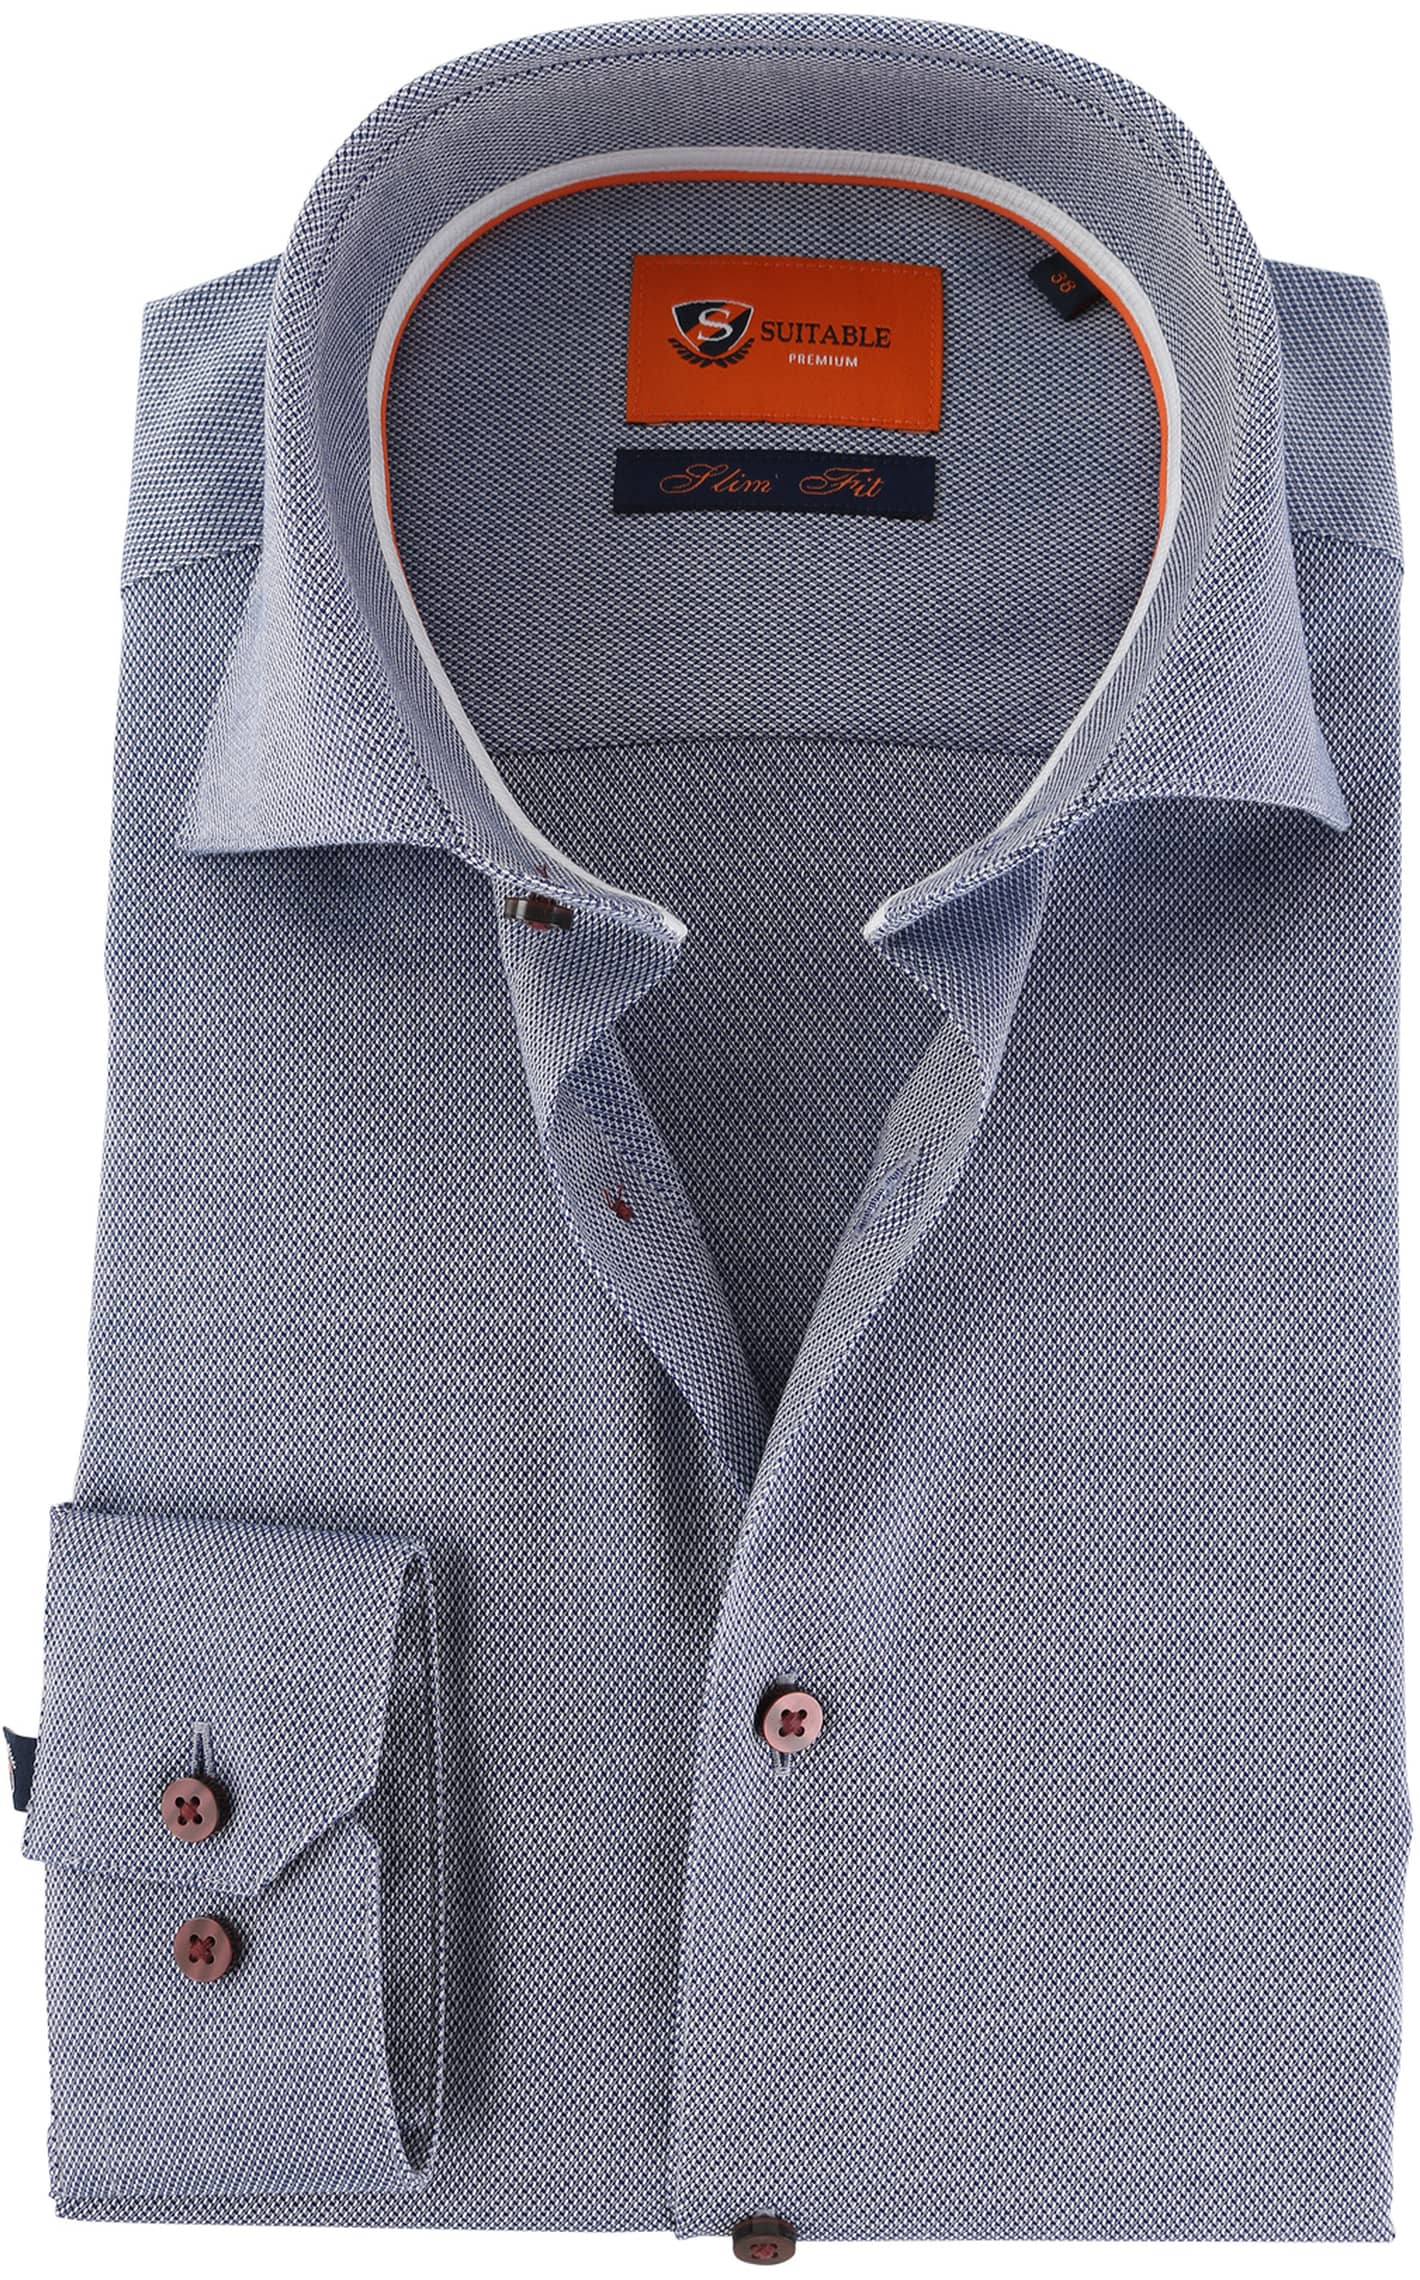 Suitable Overhemd Donkerblauw D72-04 foto 0